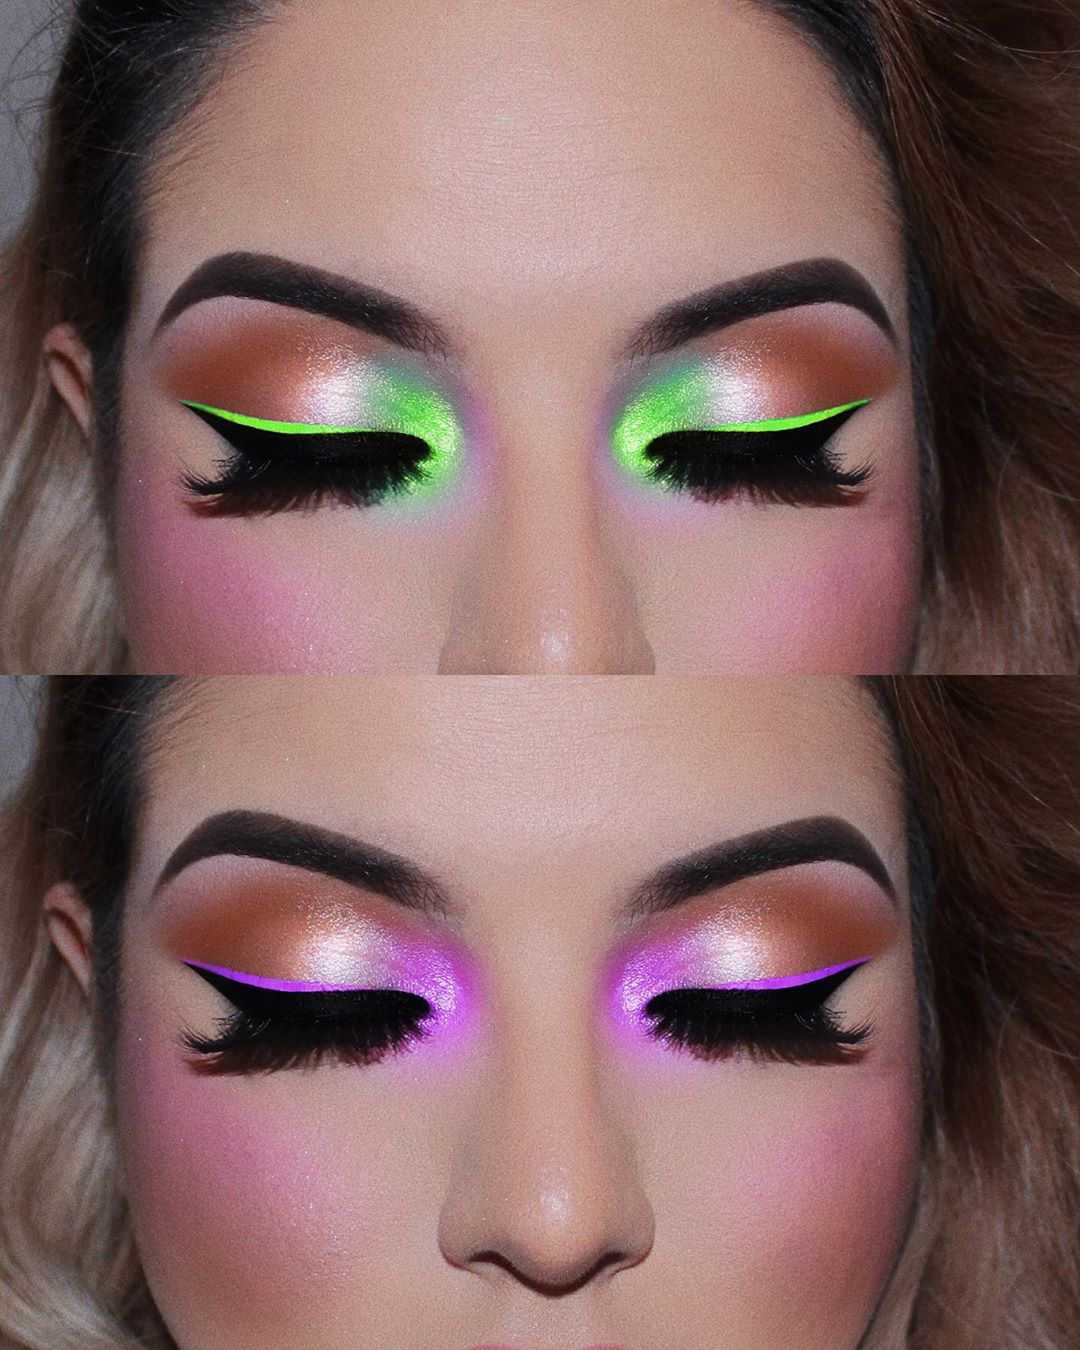 Maquiagem sombra neon carnaval